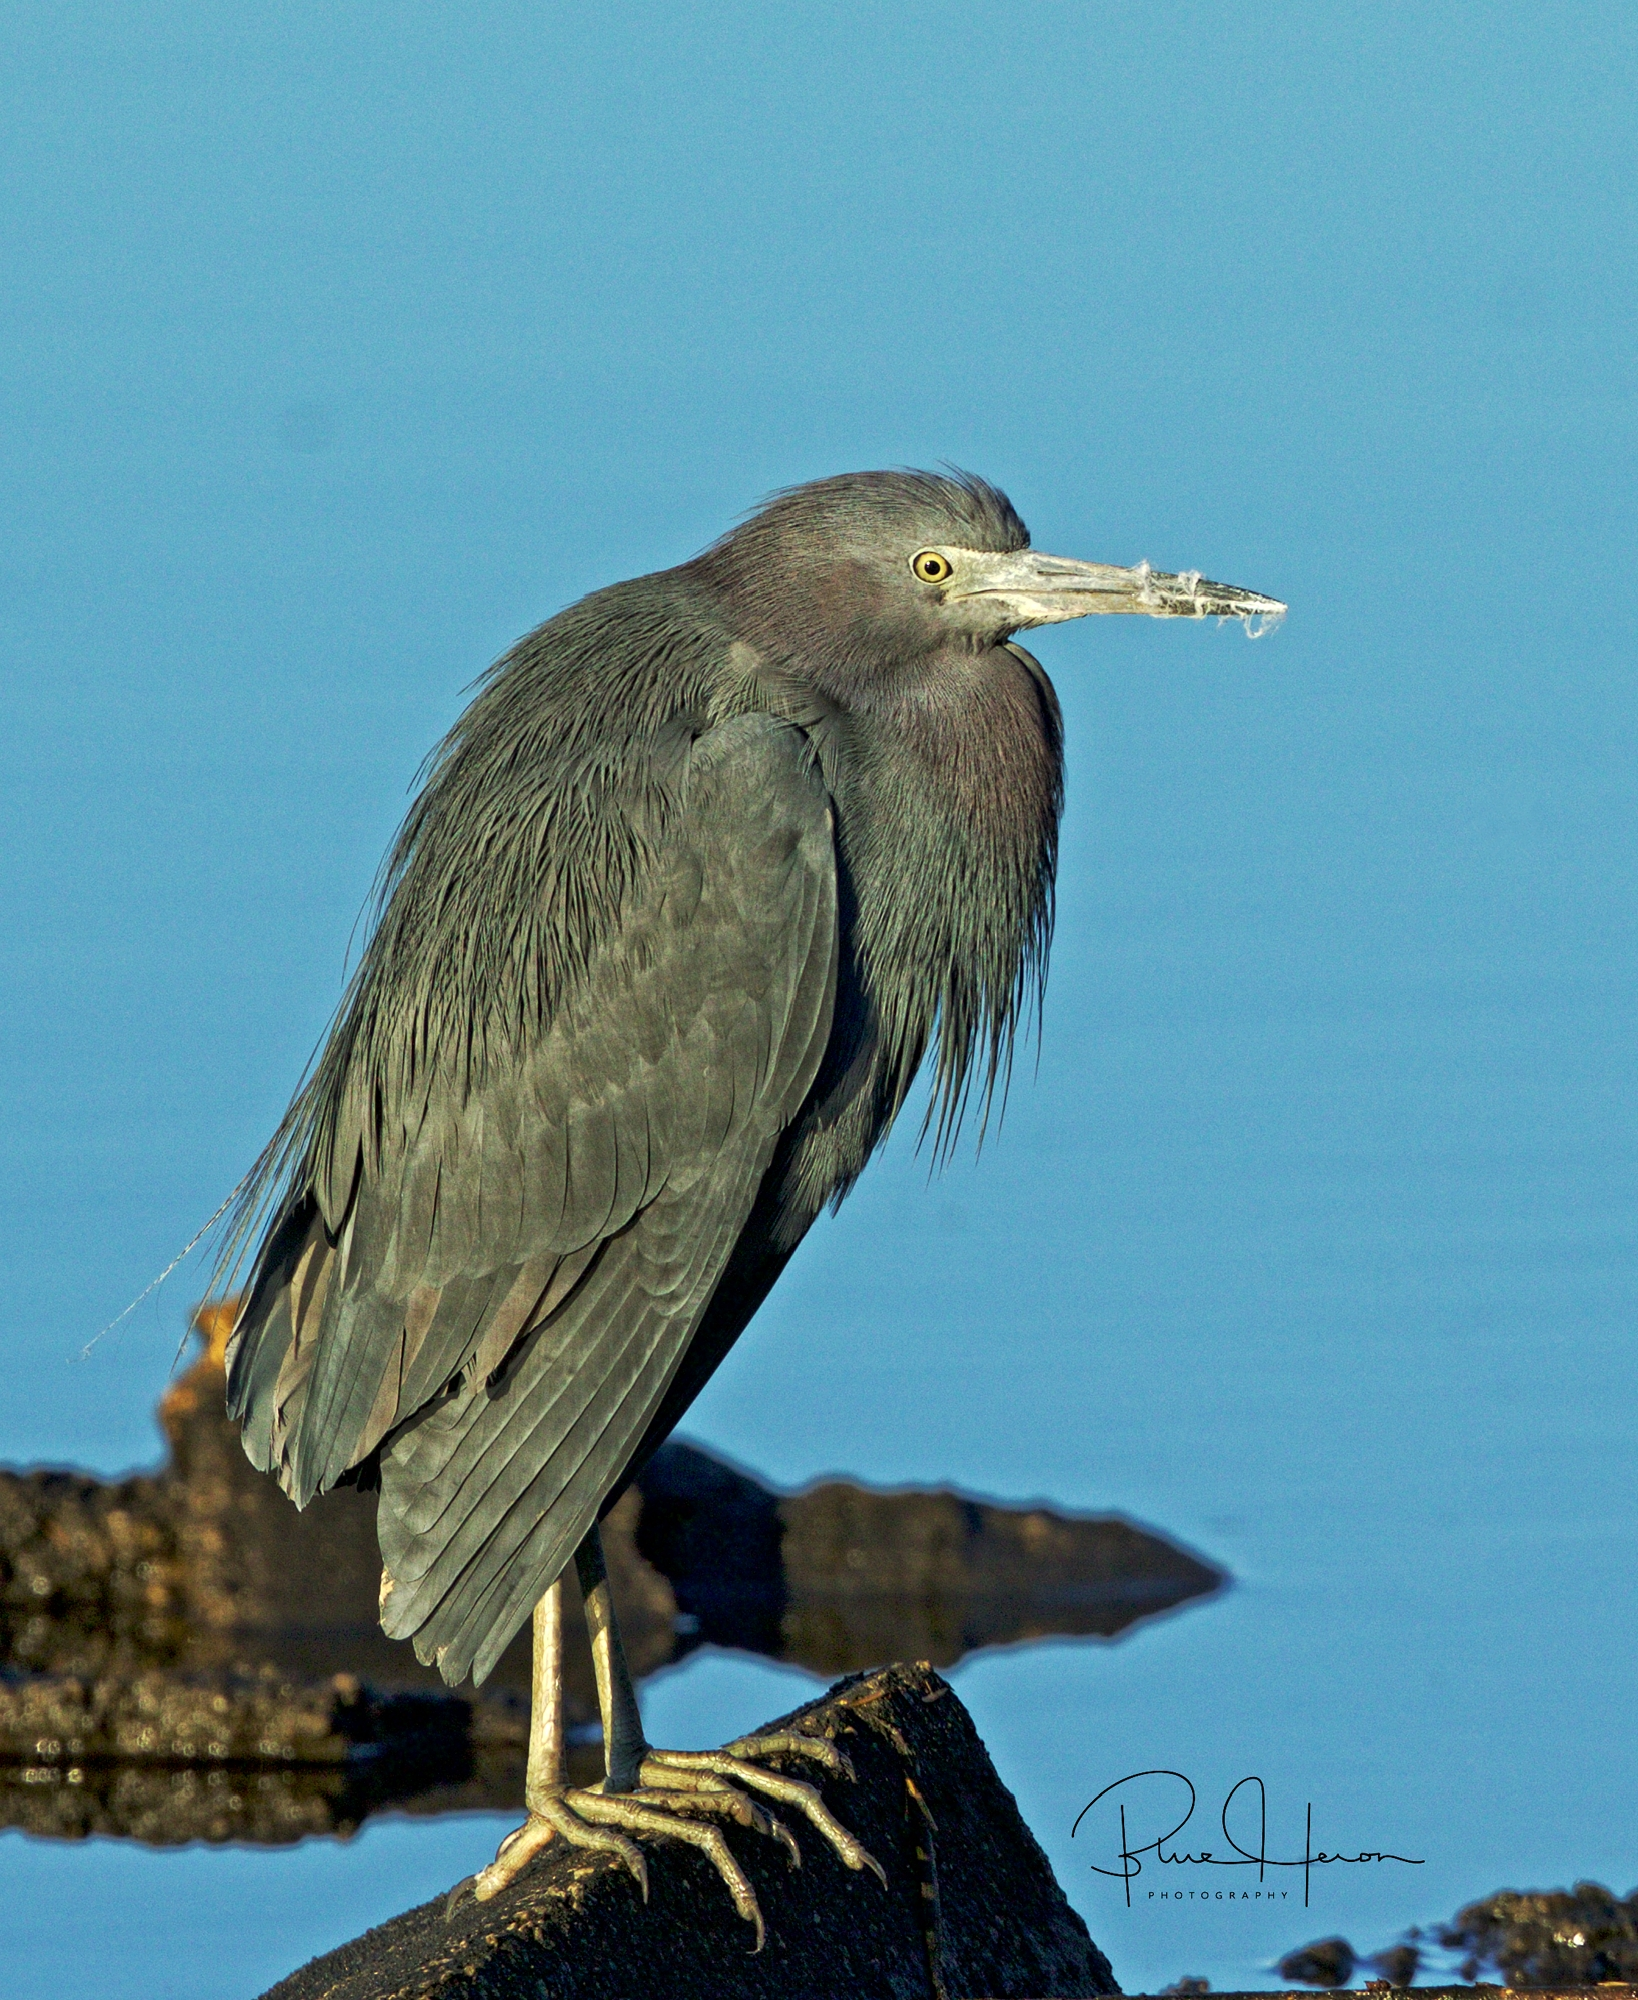 Broward Bob, the Little Blue Heron seems a bit stiff..